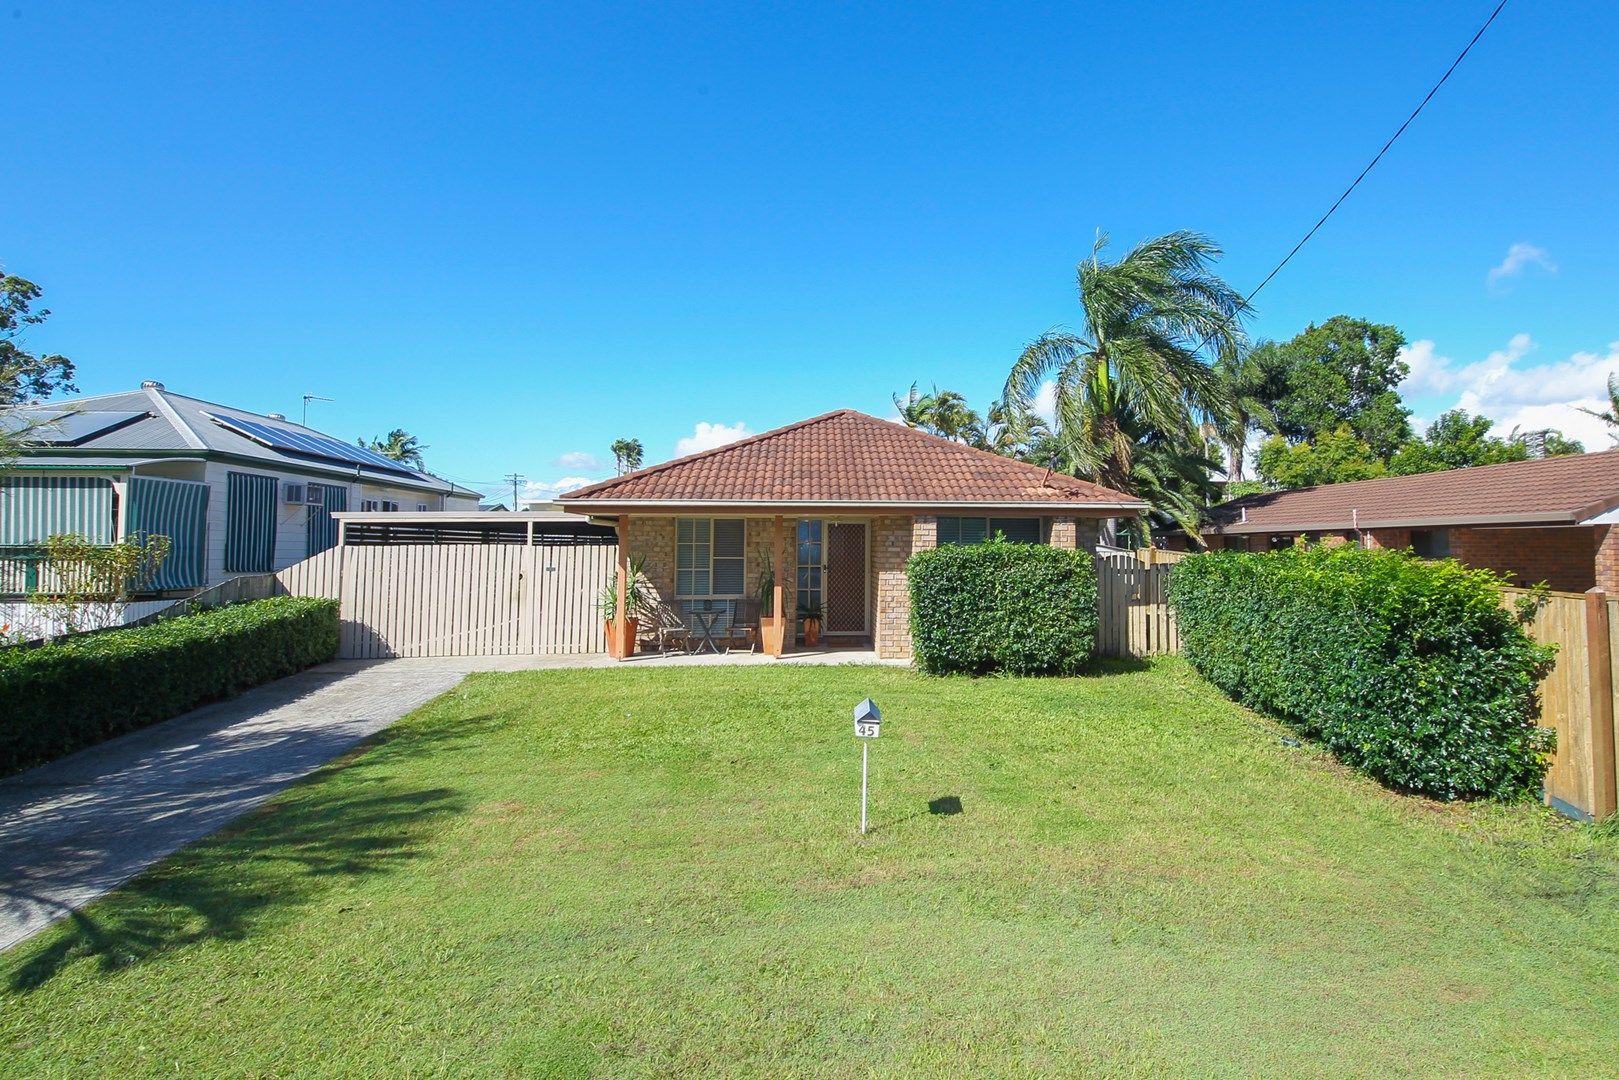 45 Tooraneedin Road, Coomera QLD 4209, Image 0